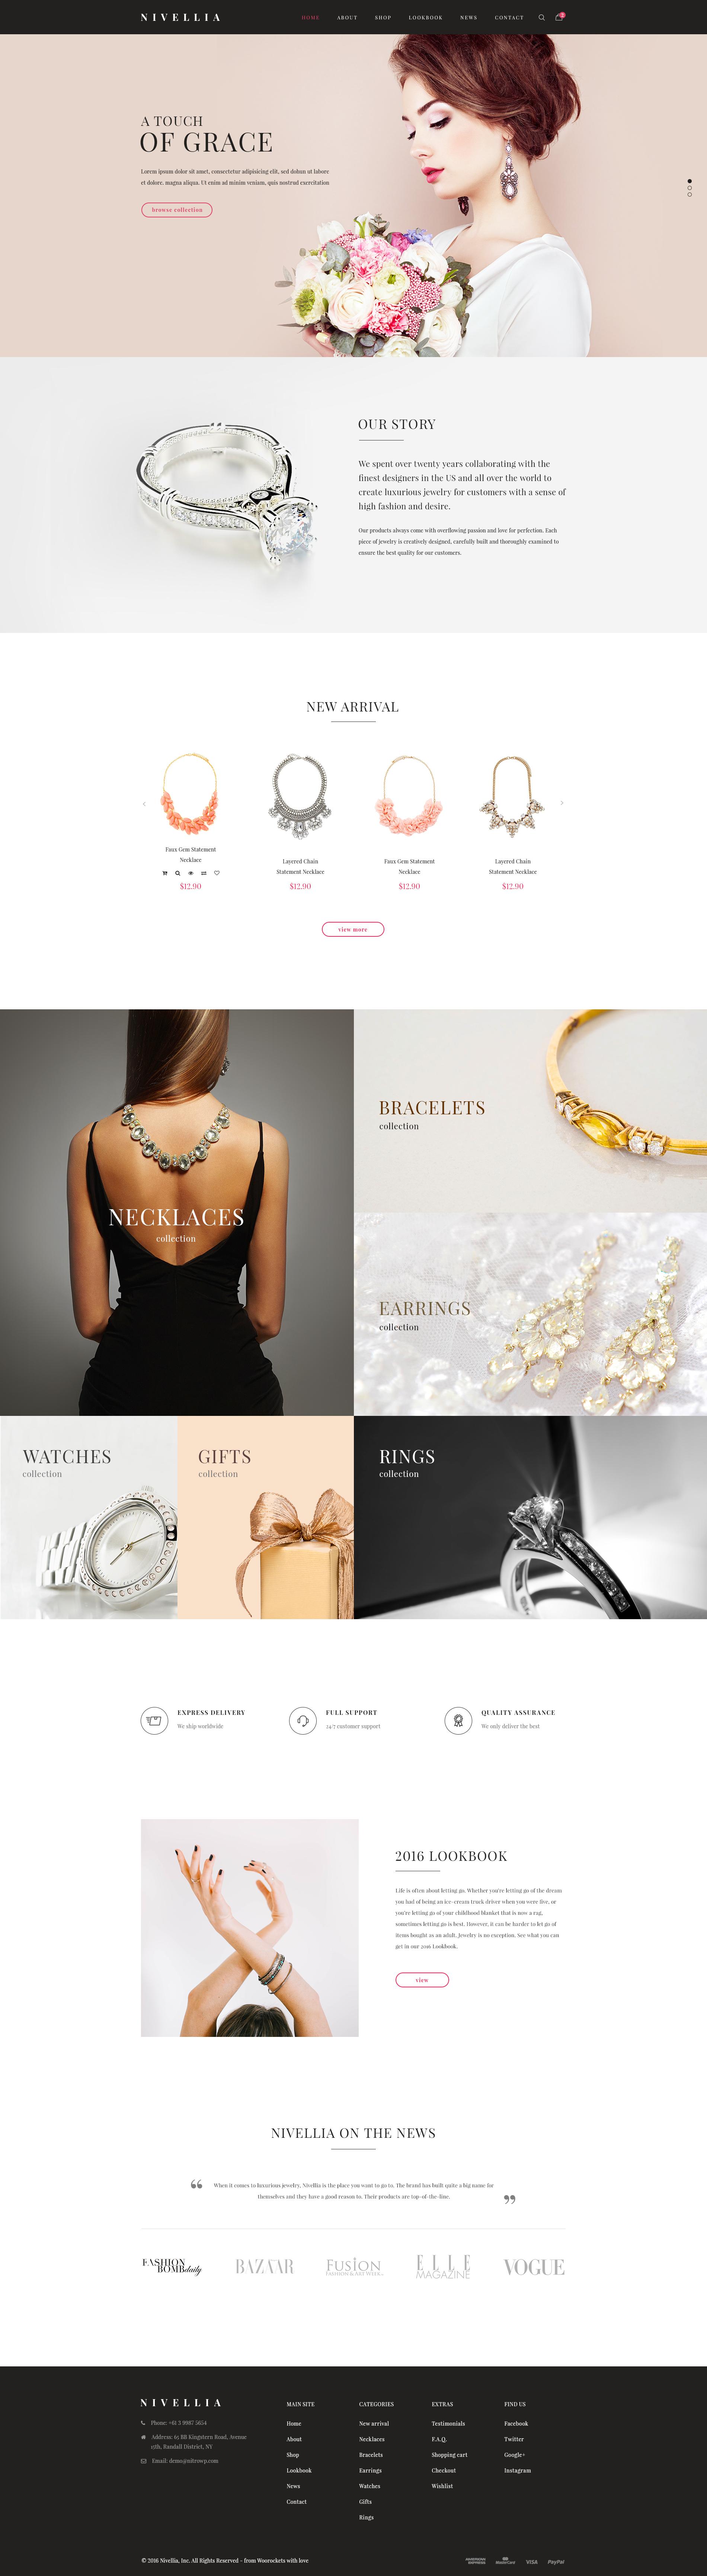 Nitro theme jewelry